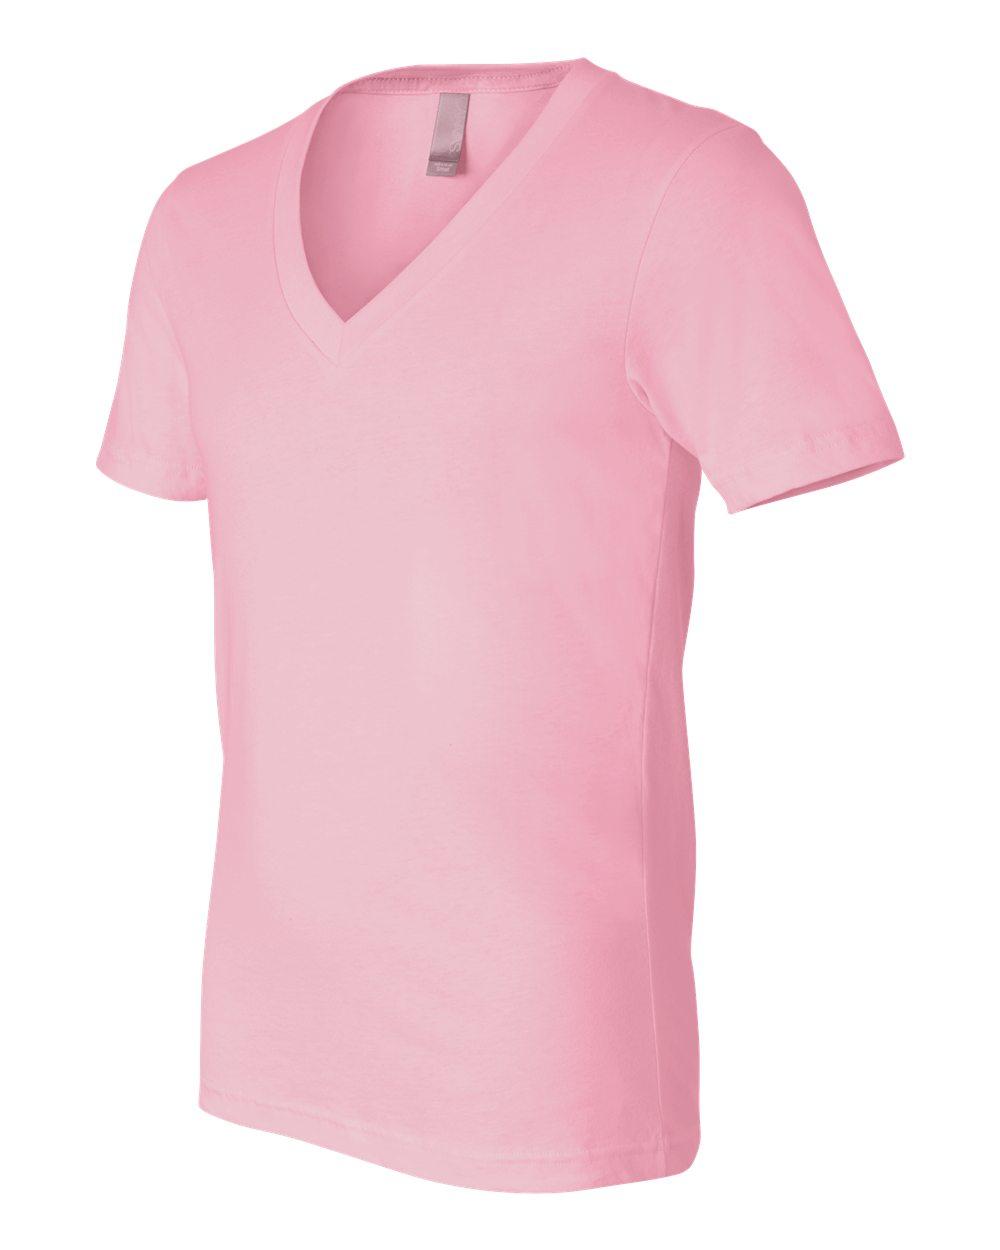 Bella 3105 Soft Pink